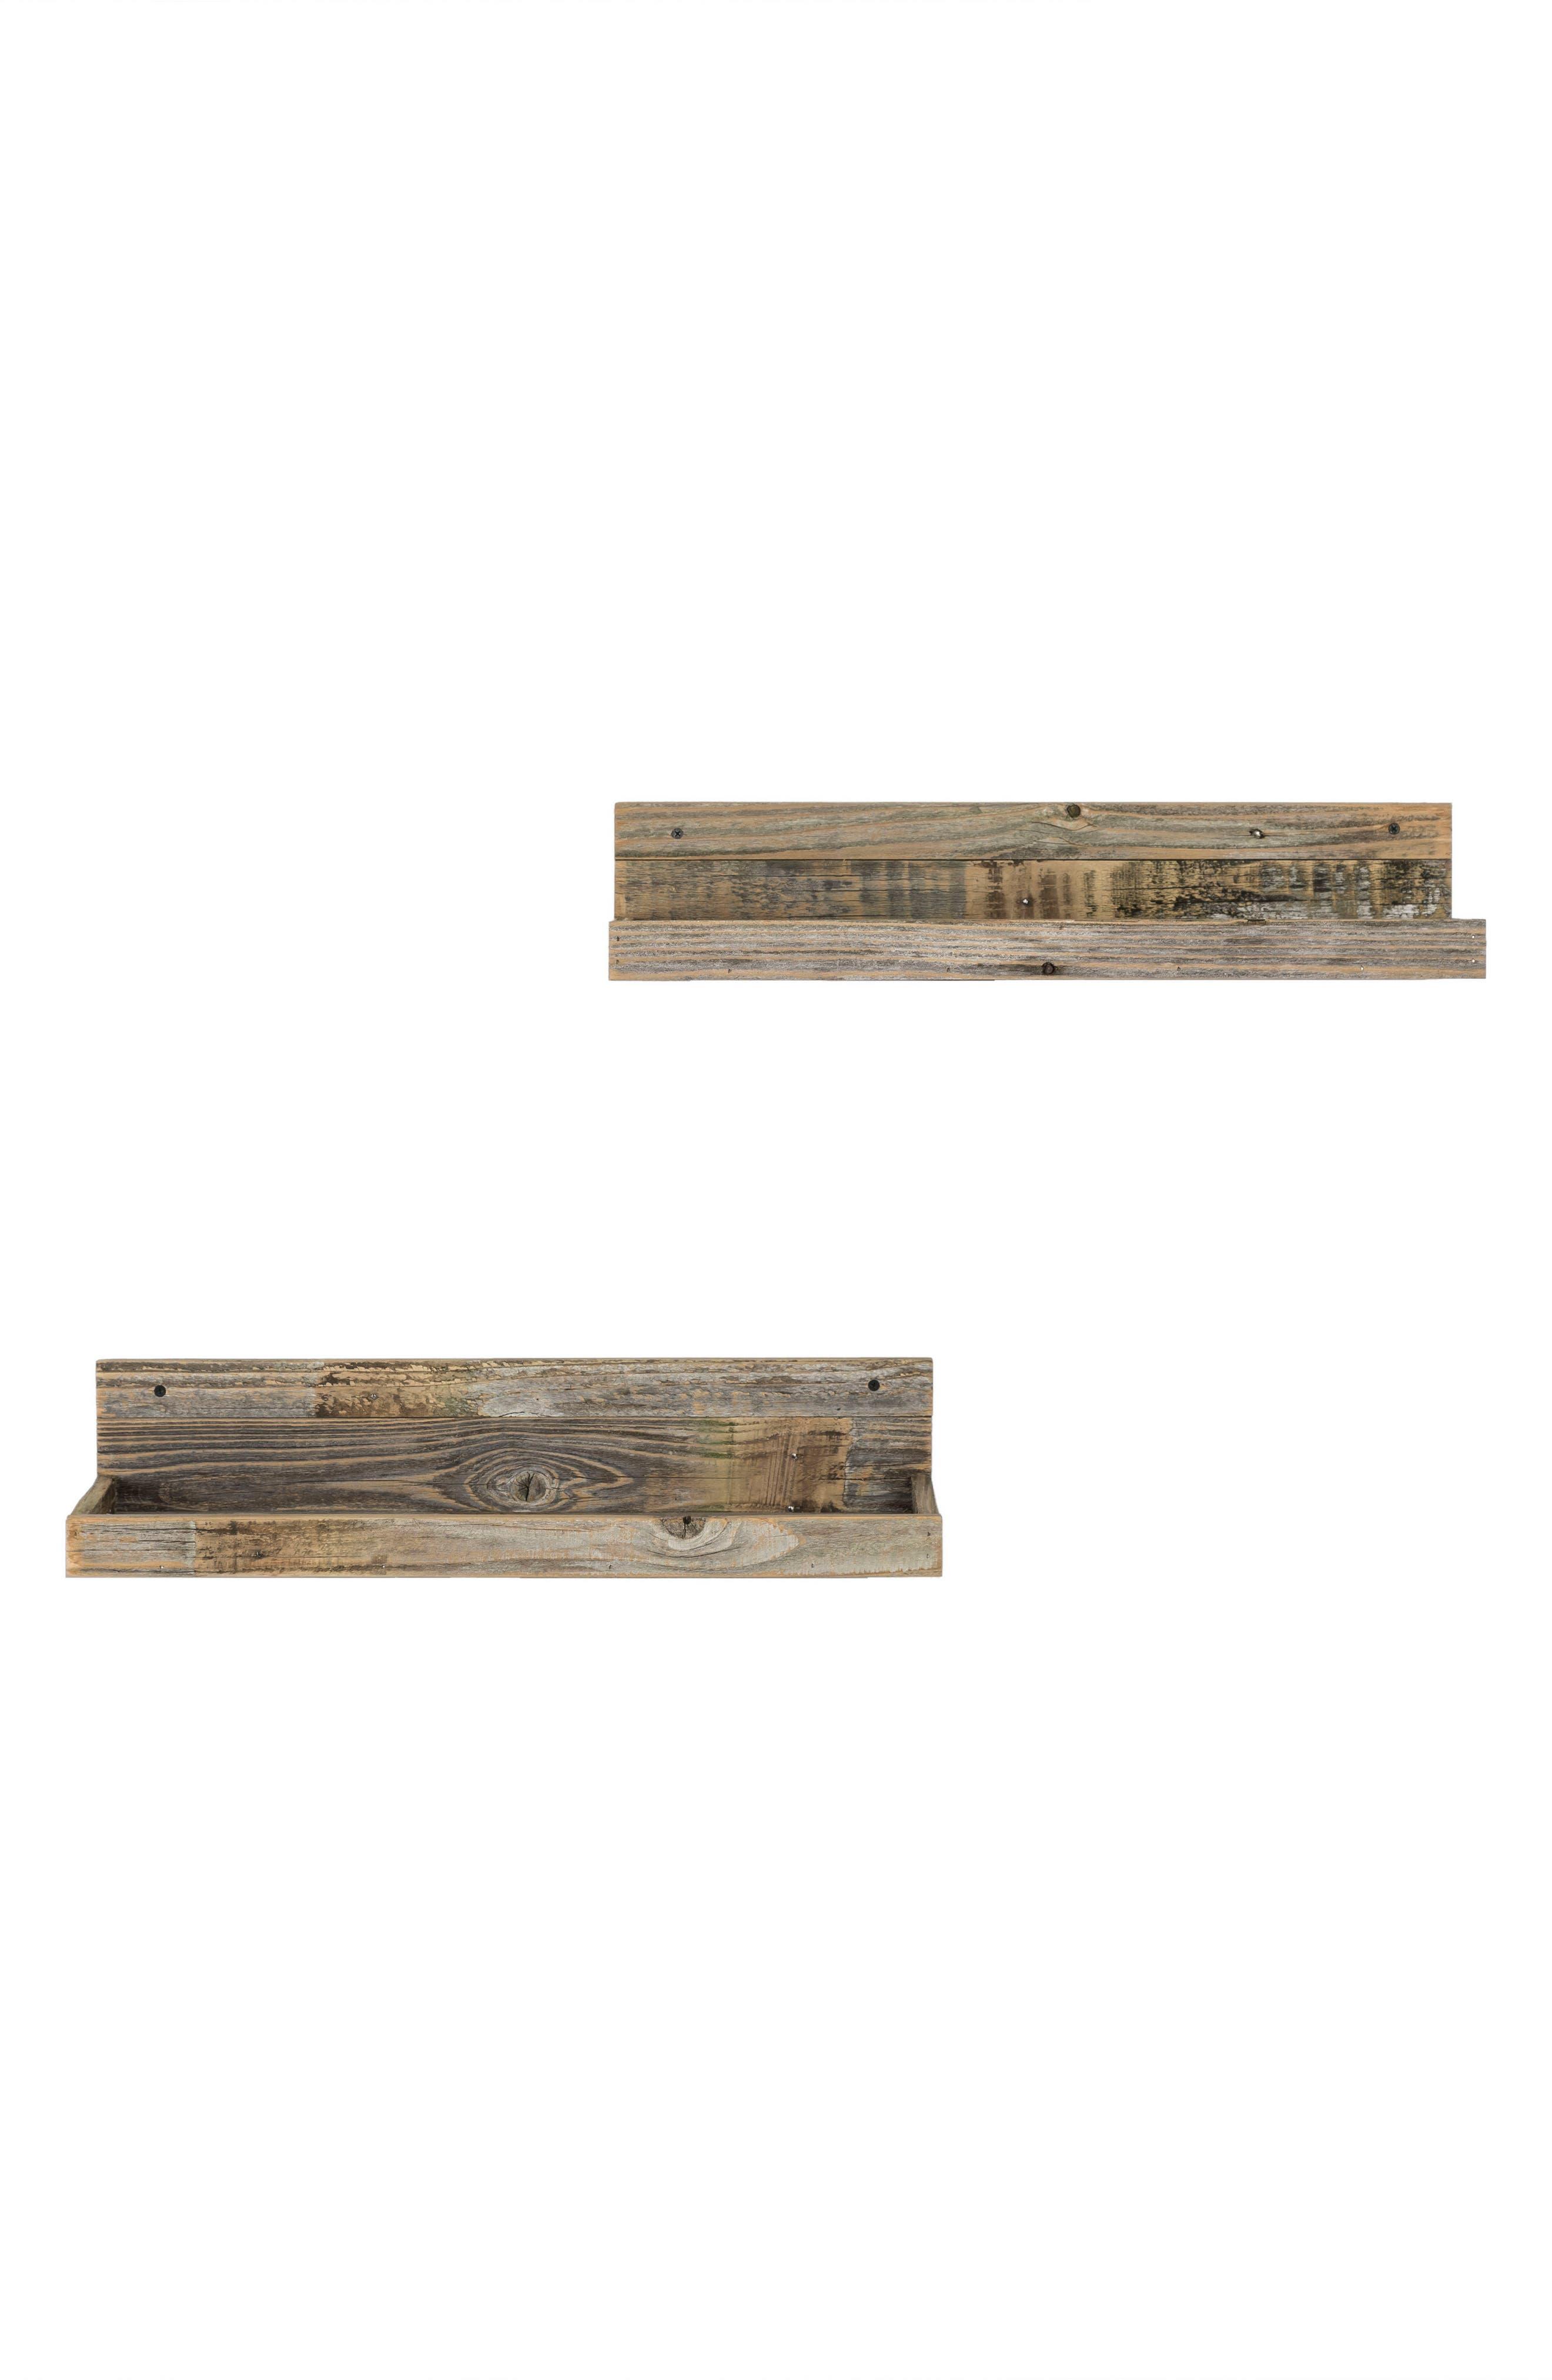 Set of 2 Floating Reclaimed Barnwood Shelves,                             Main thumbnail 1, color,                             200